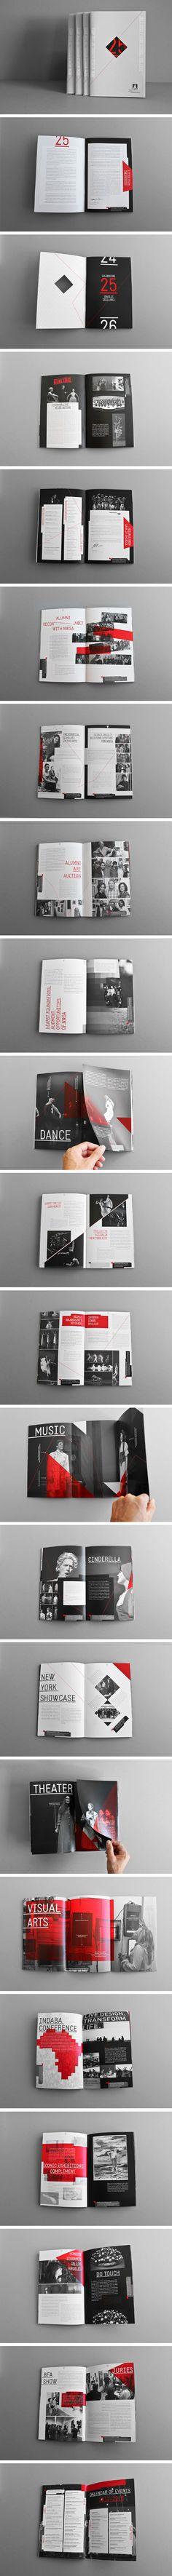 NEW WORLD SCHOOL OF THE ARTS MAGAZINE